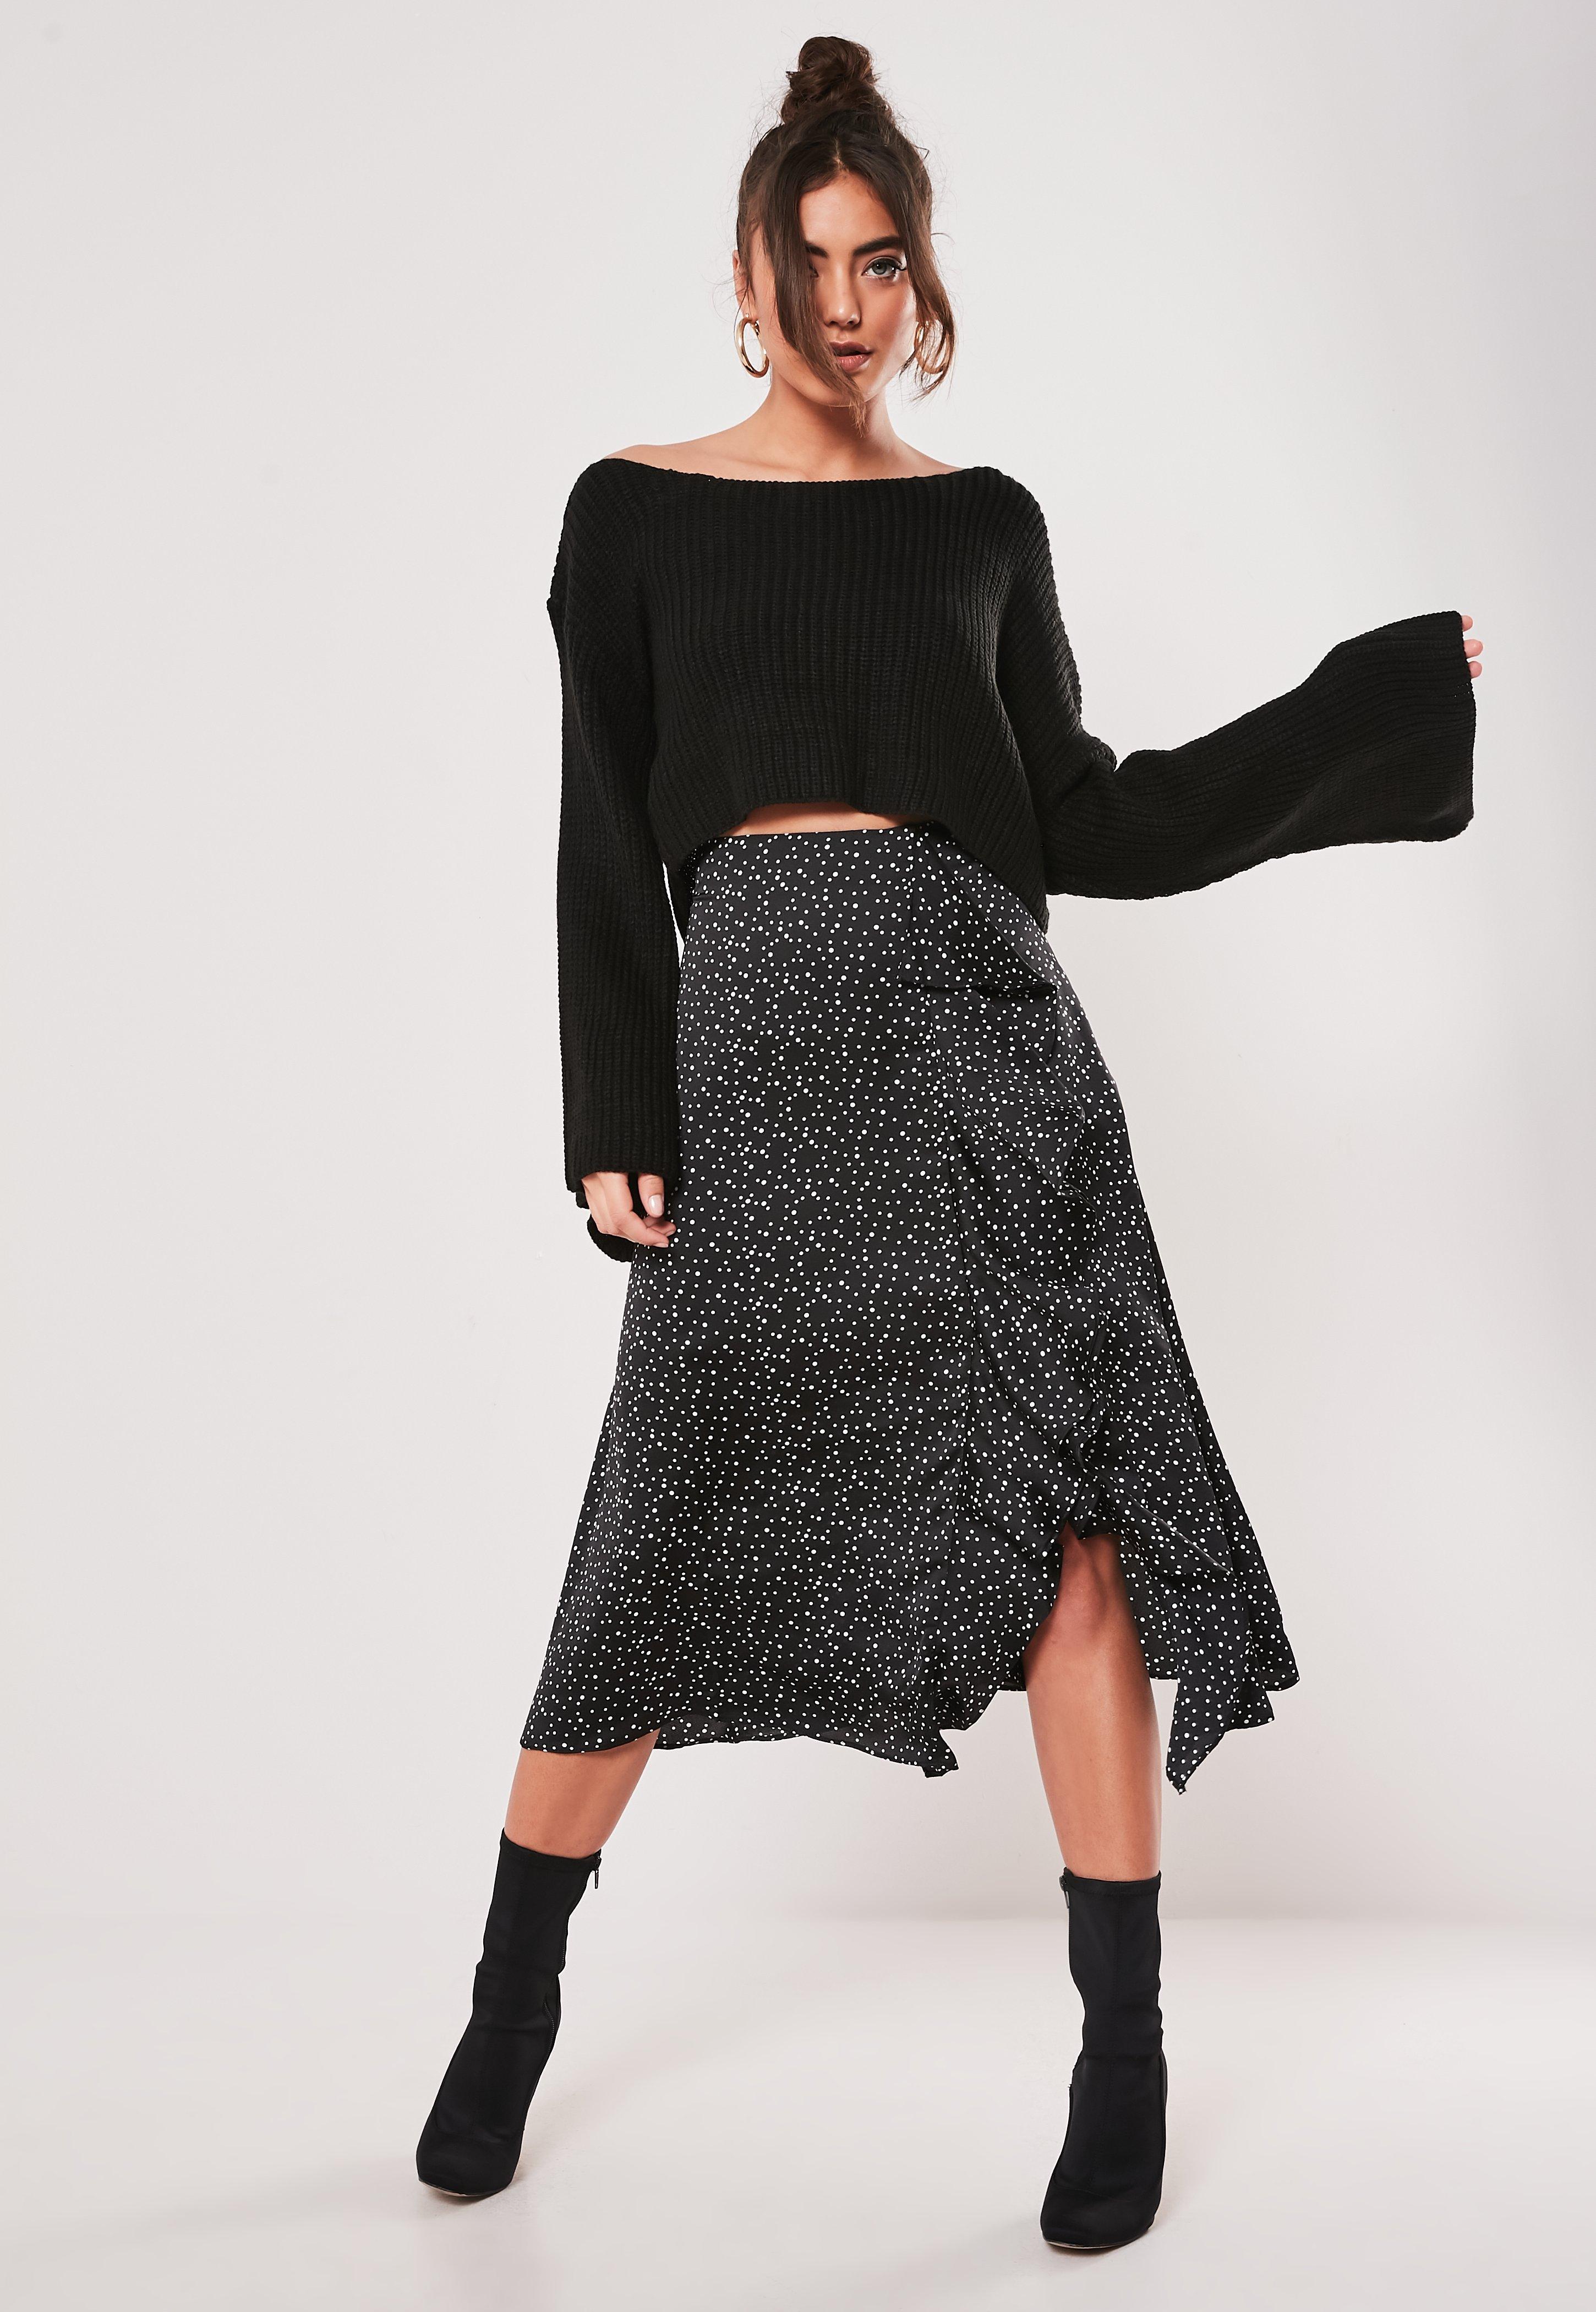 best selection of 2019 convenience goods huge range of Petite Black Polka Dot Frill Midi Skirt